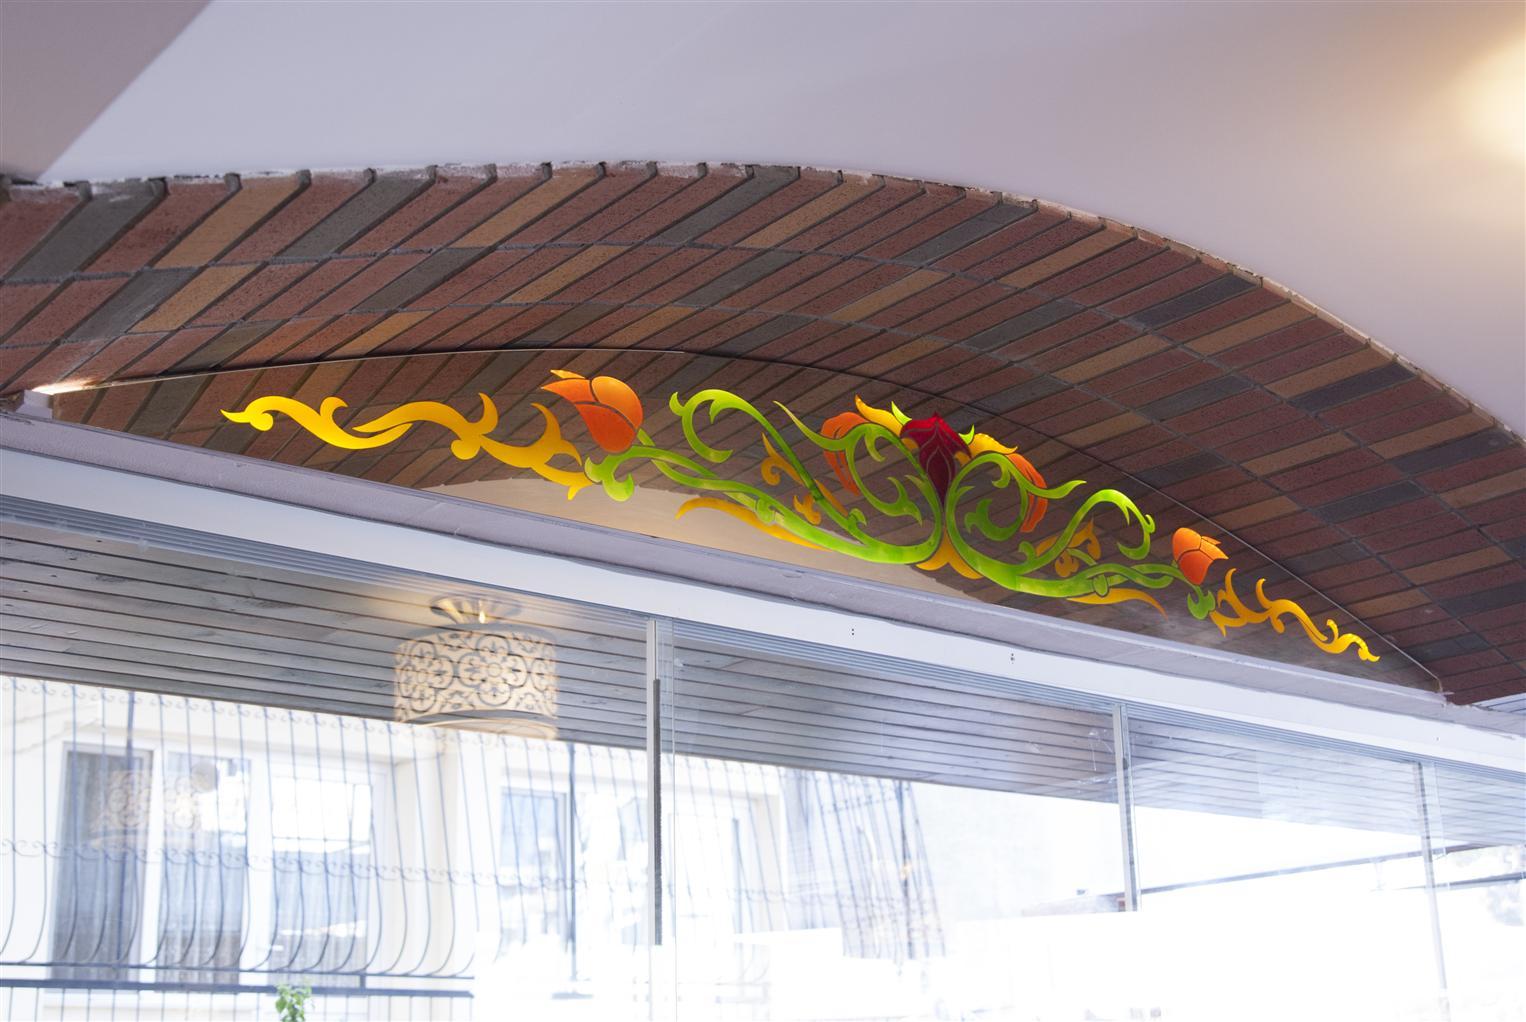 adria-cafe201592117353650.jpg izmir vitray çalışması